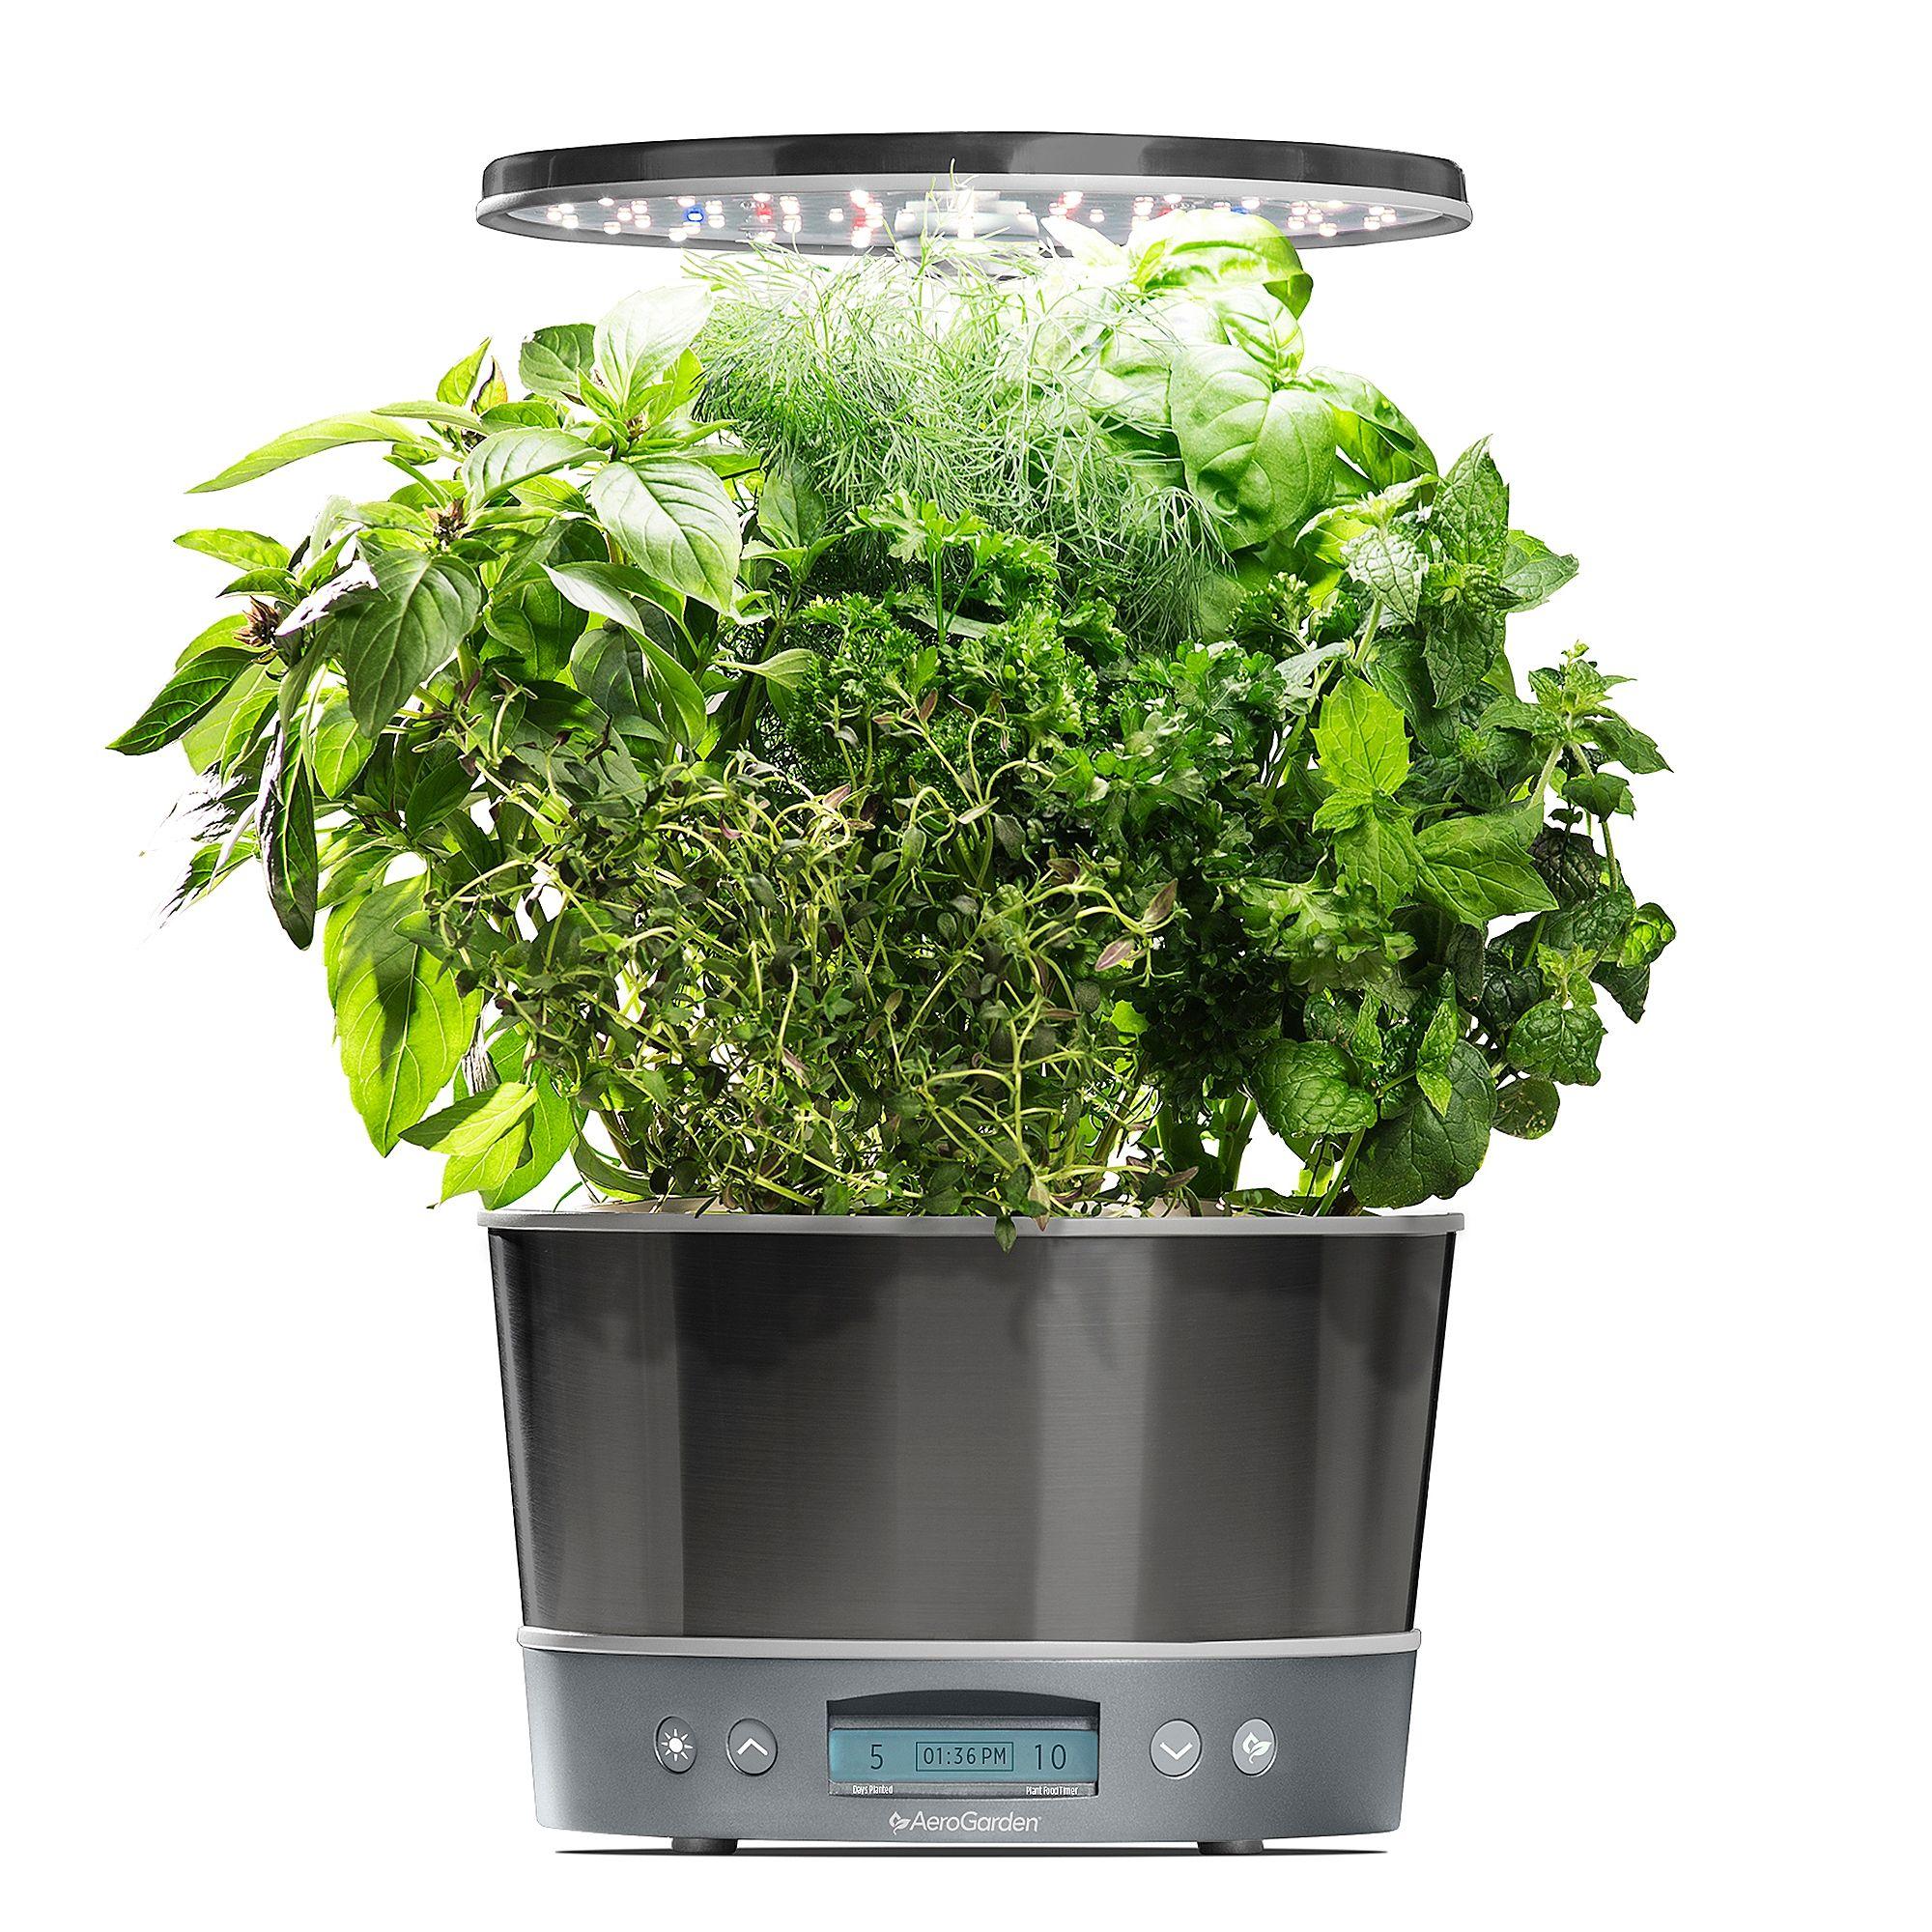 Aerogarden® Harvest Elite 360 Garden System Gourmet 400 x 300